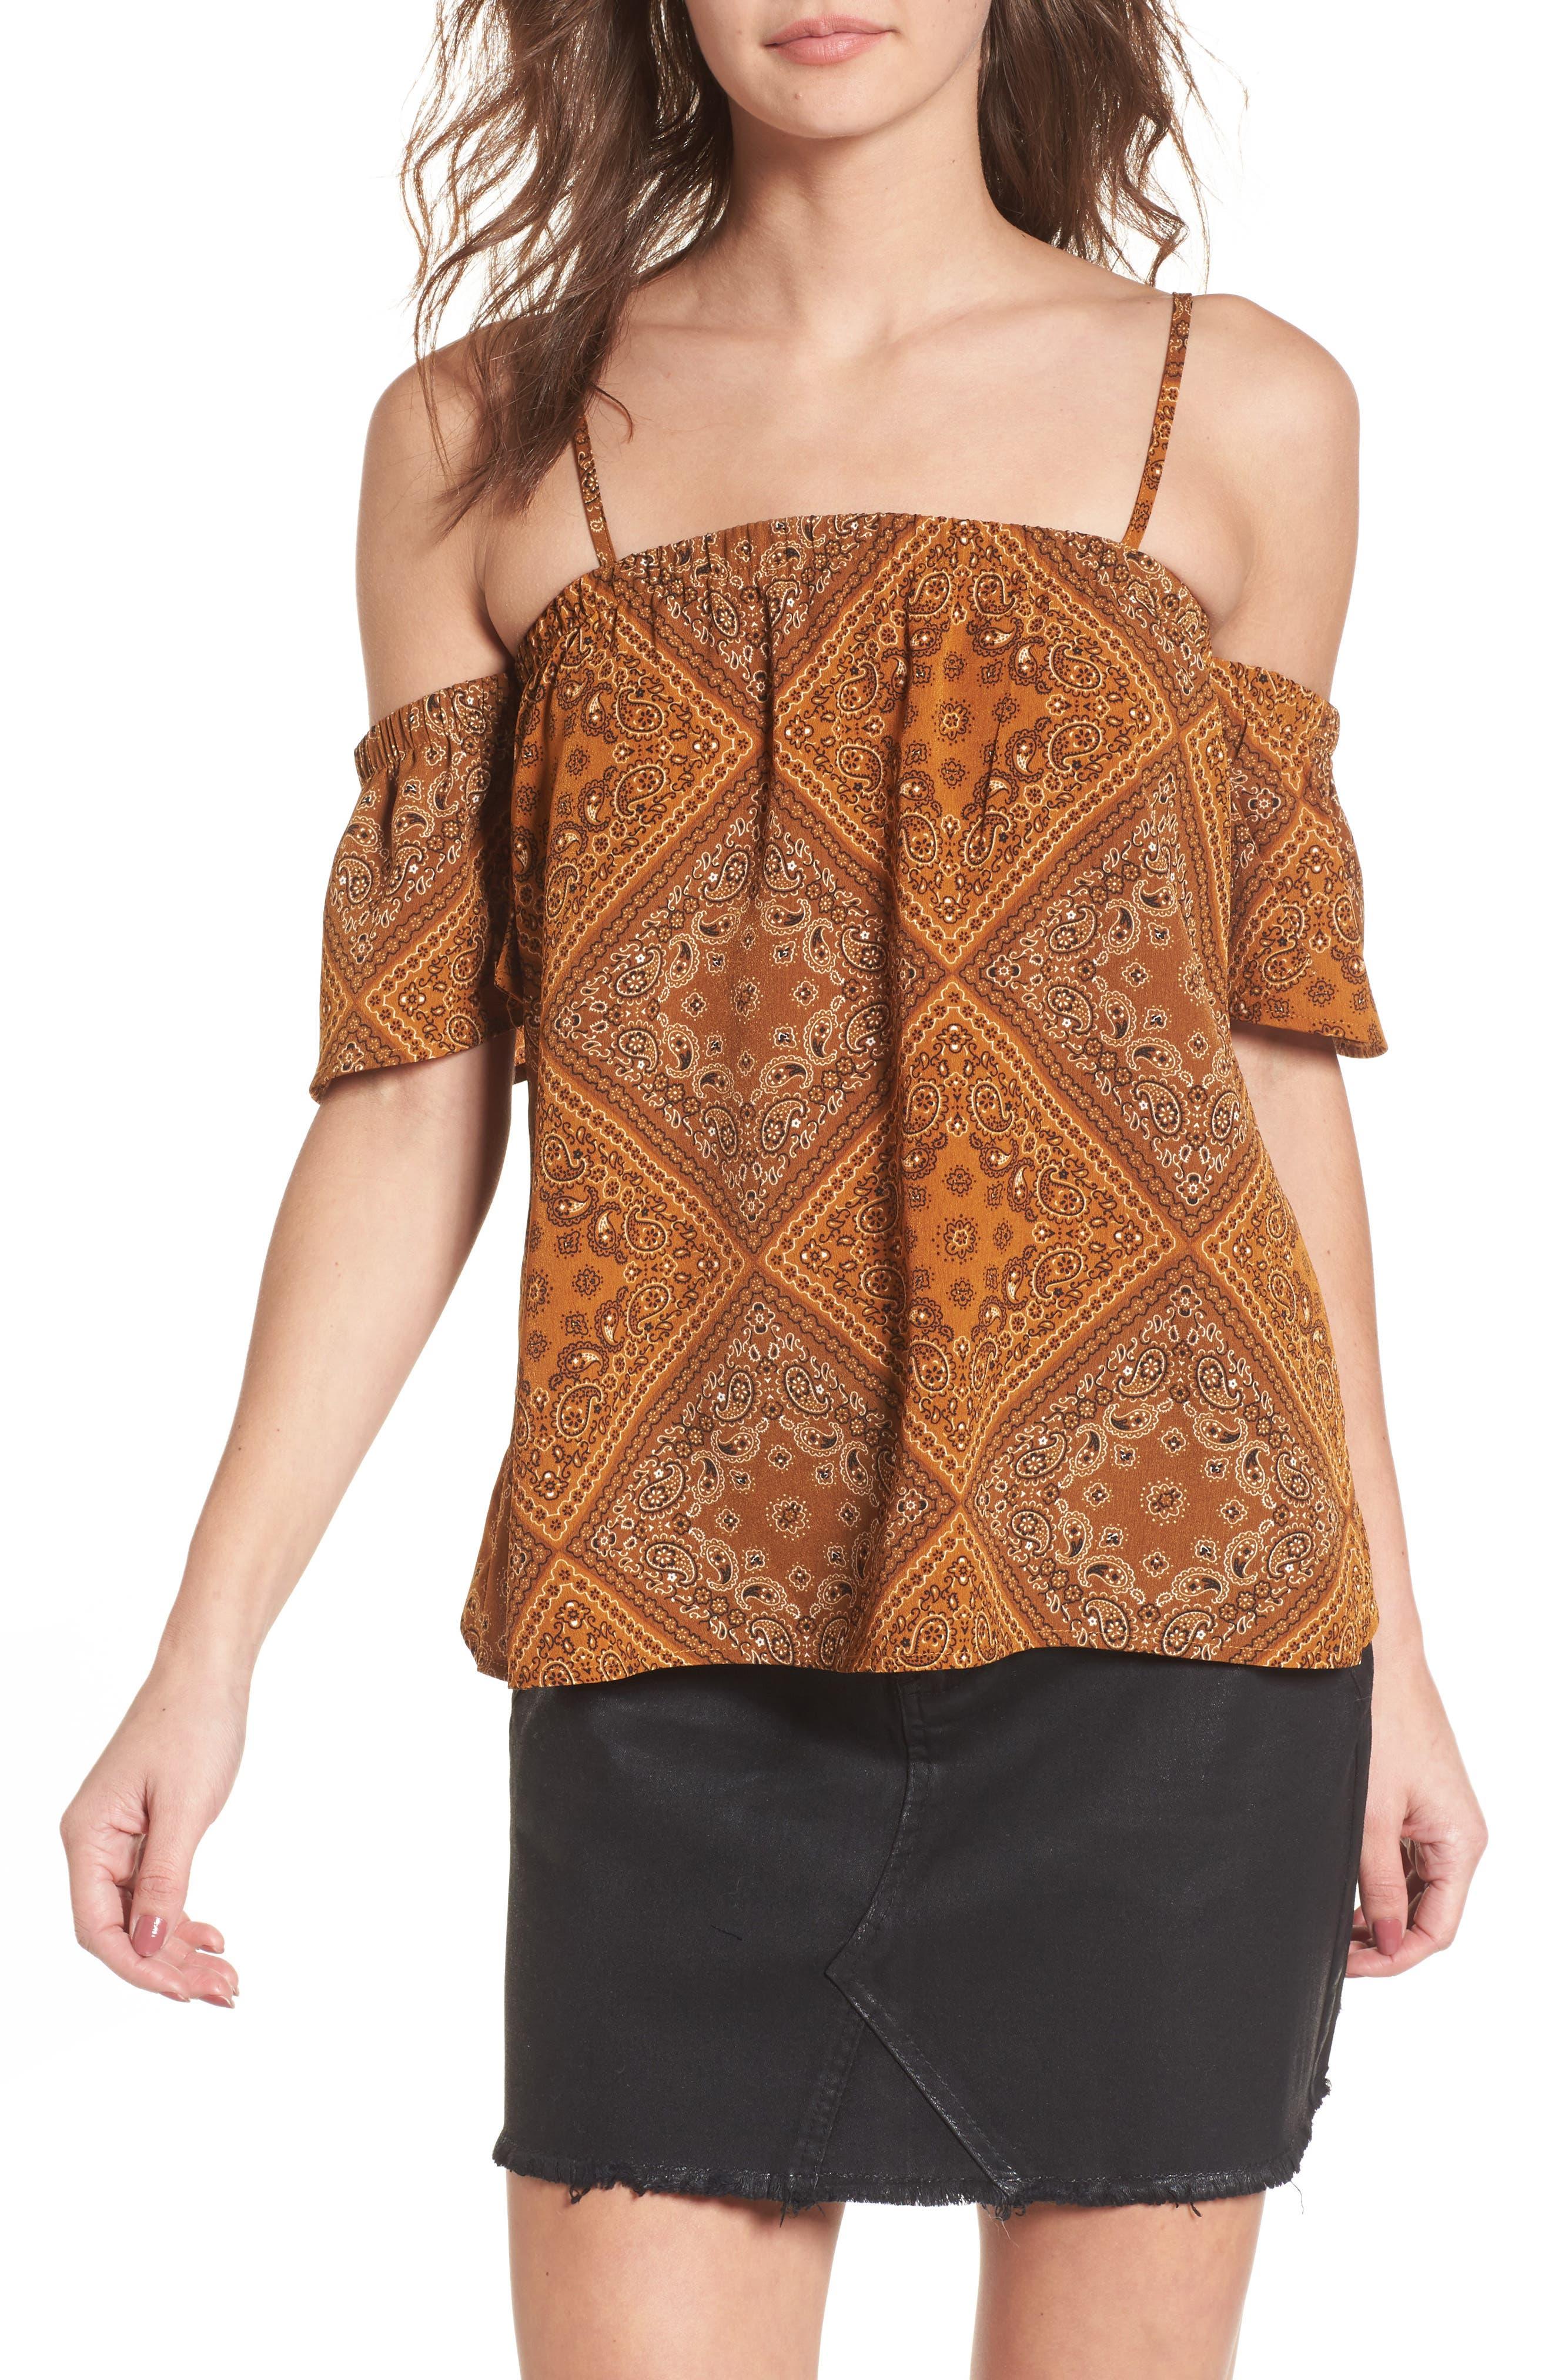 Main Image - Lira Clothing Zeze Top